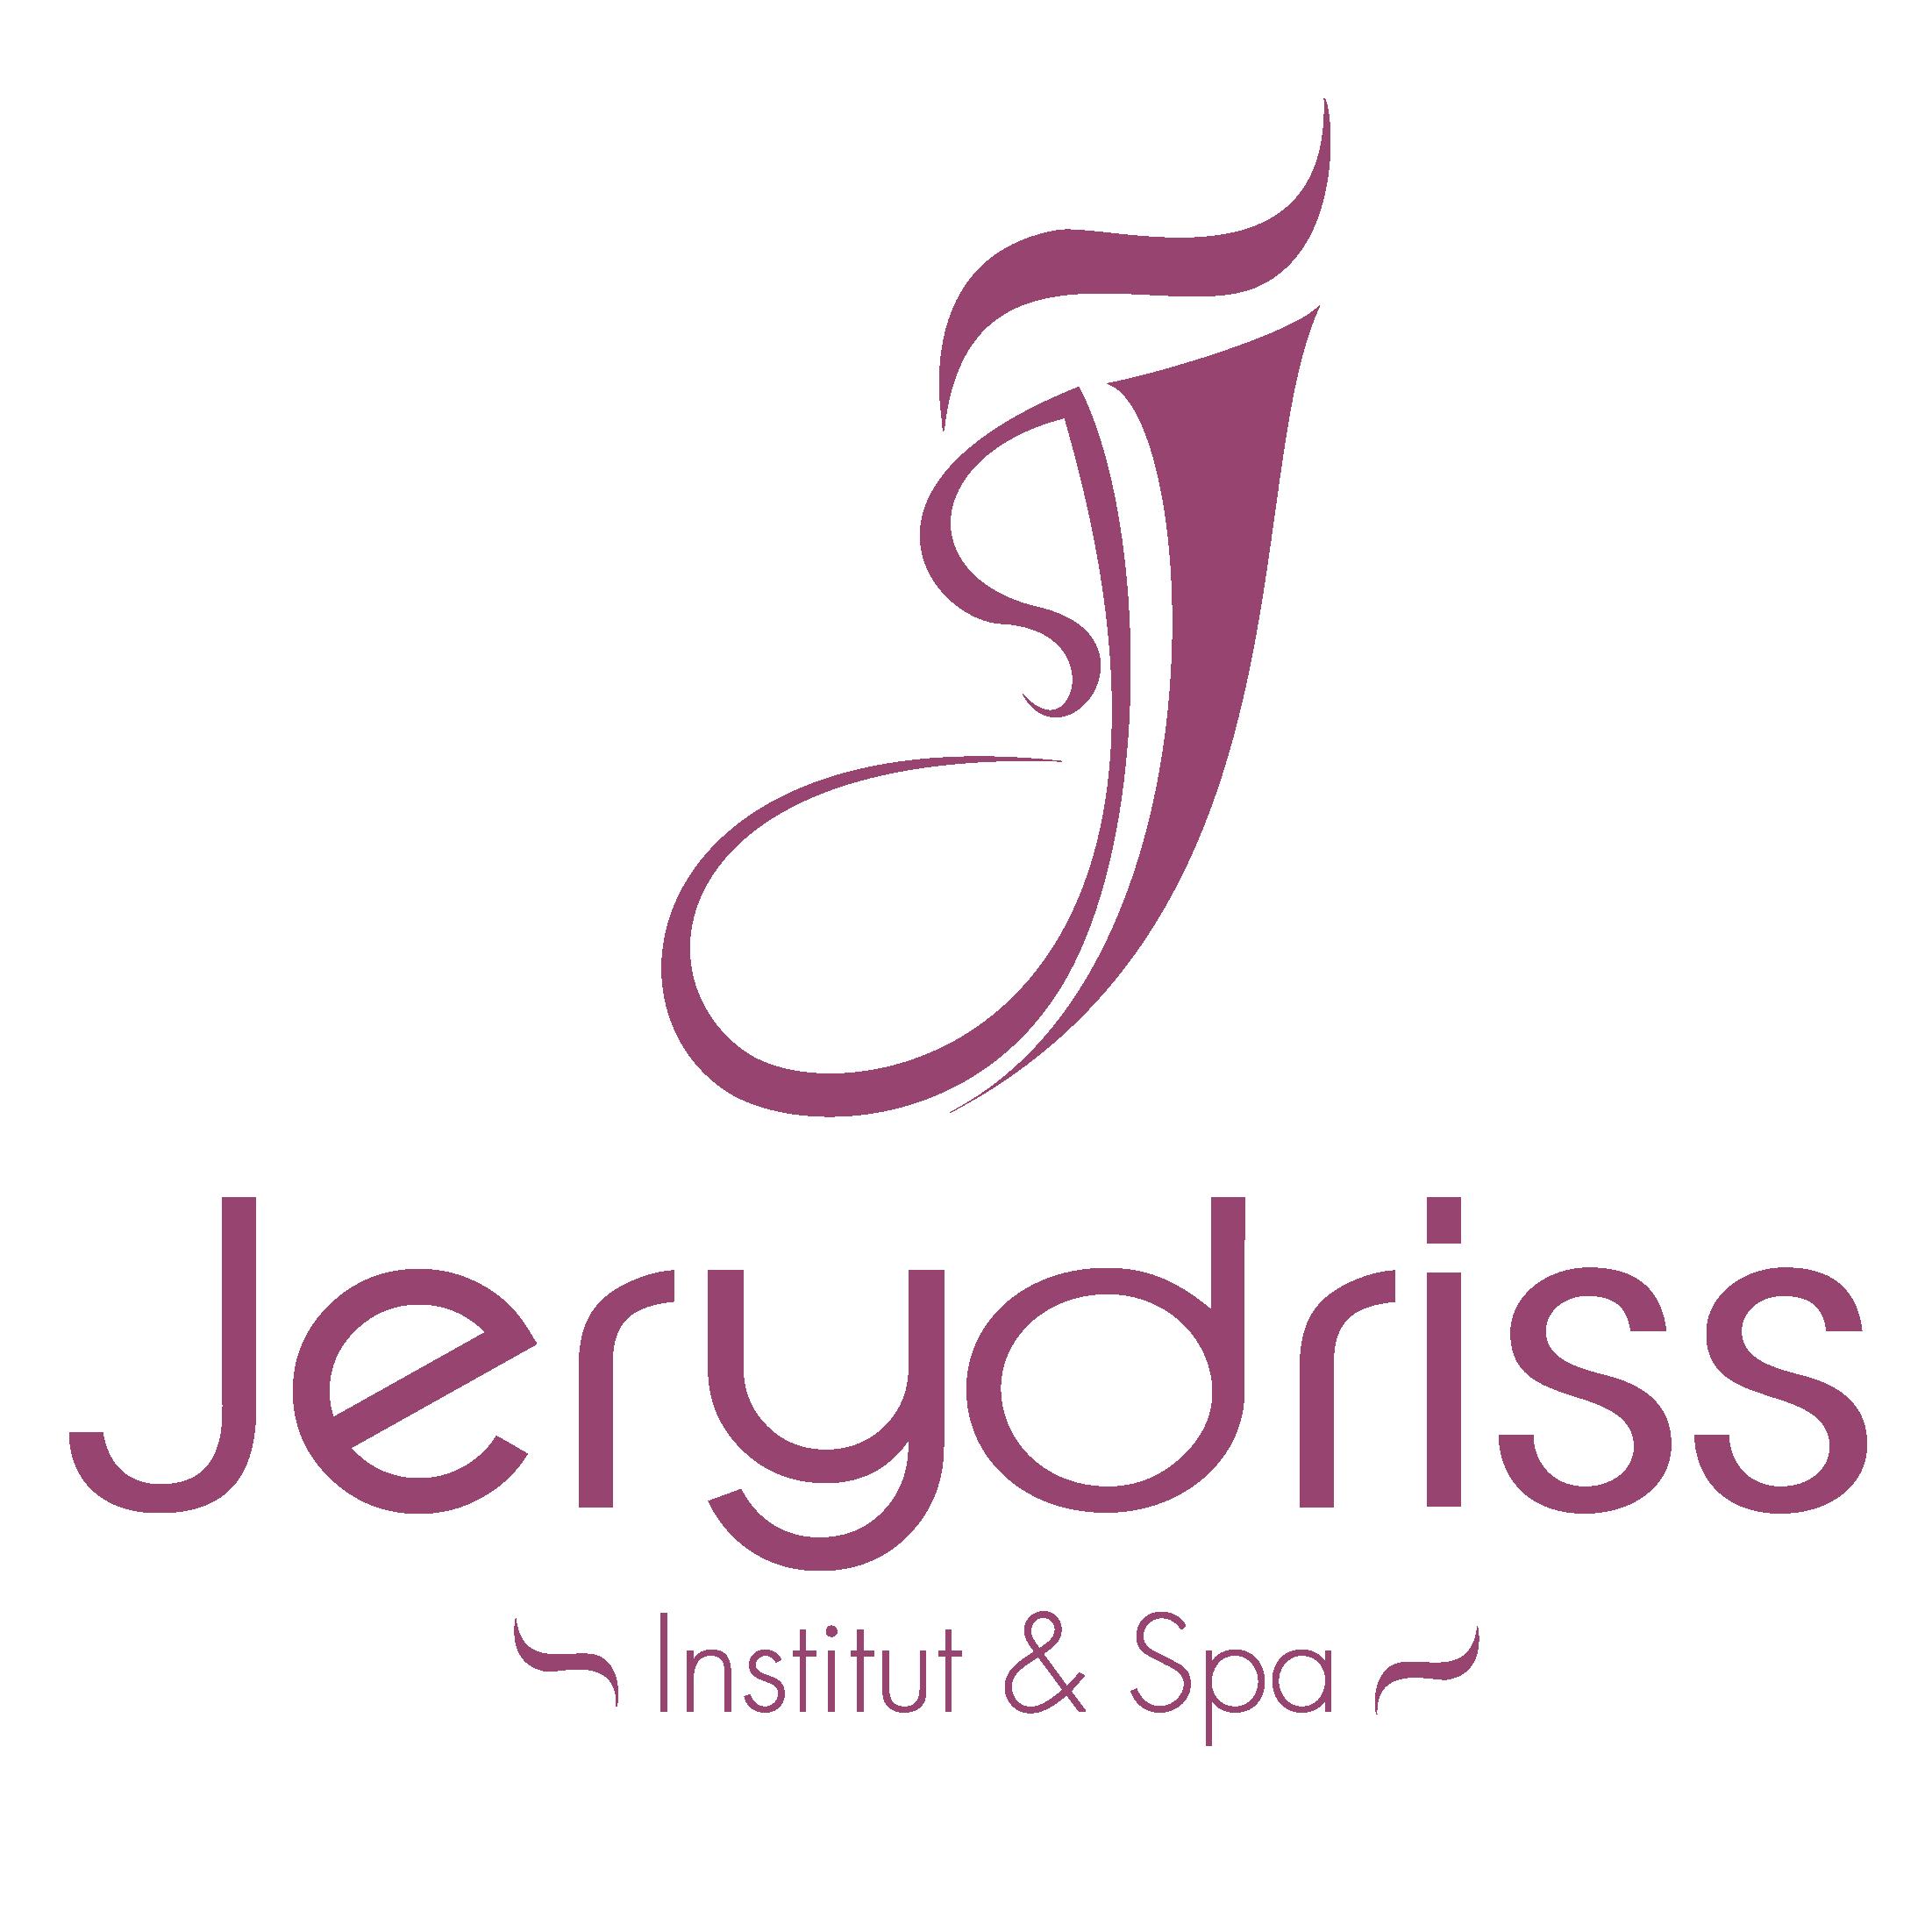 Jerydriss